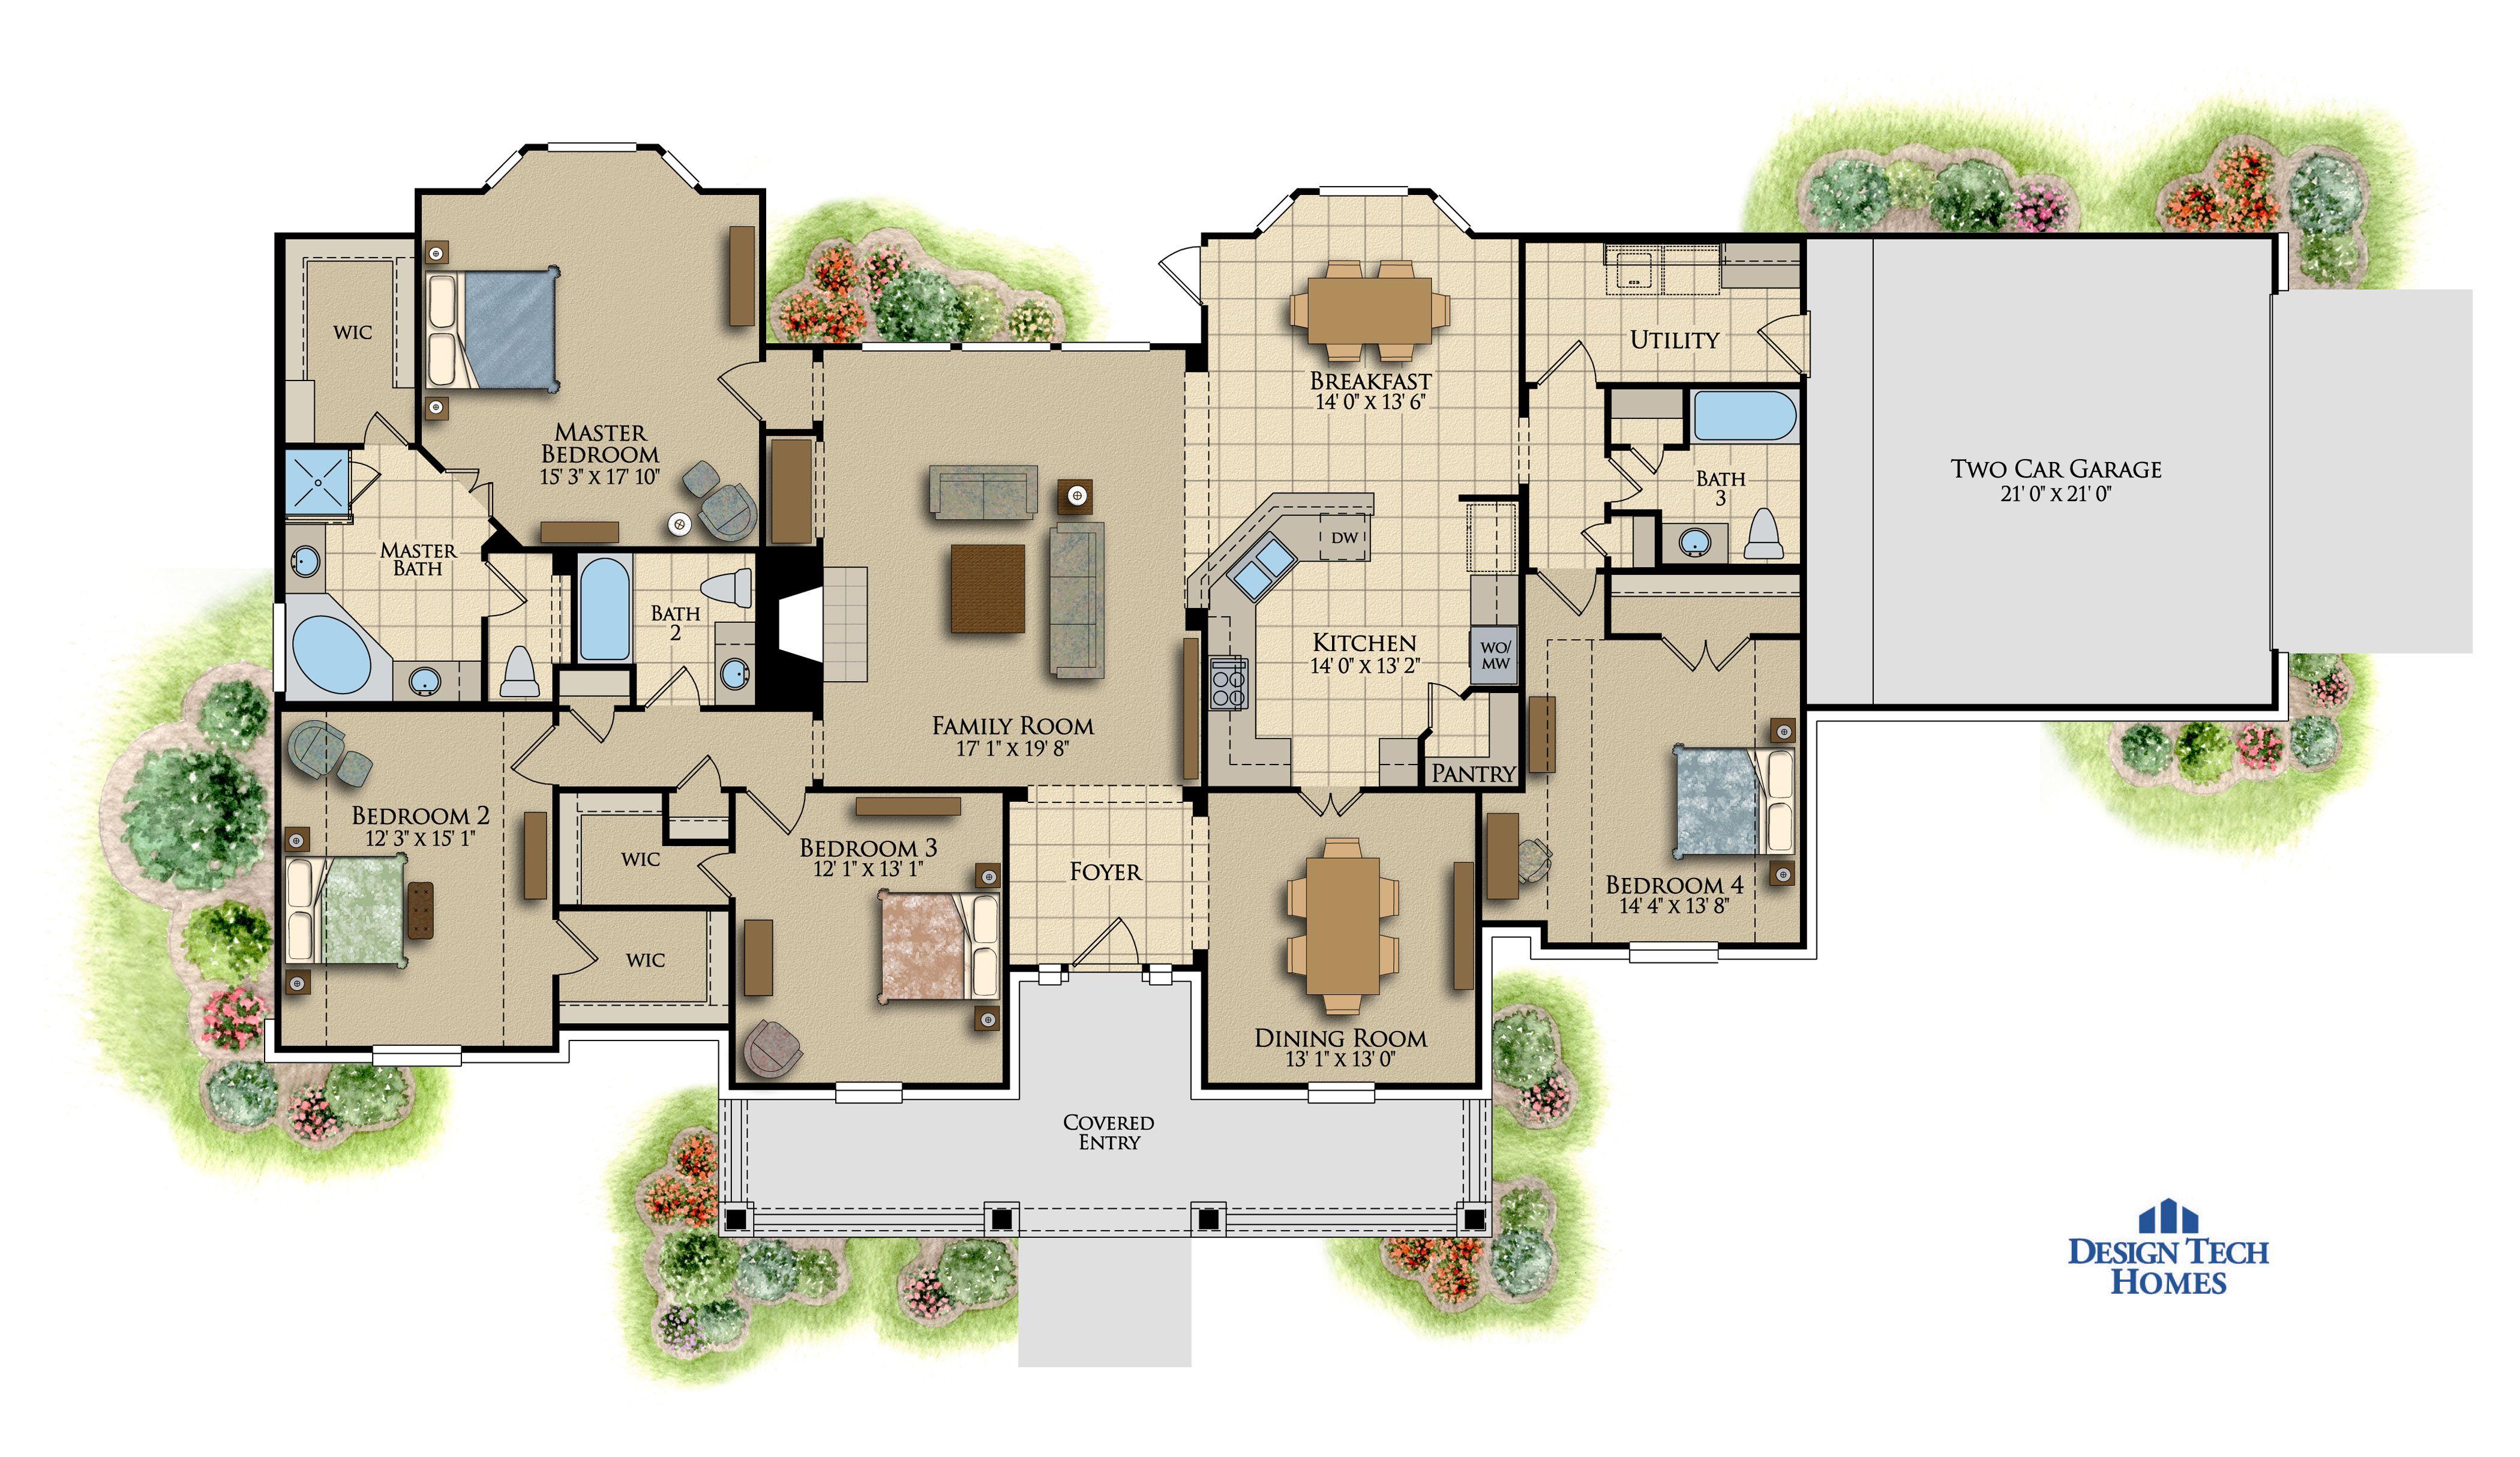 The Carrington   Plus Sq Ft House Plans Design Tech Homes - Design tech homes pricing